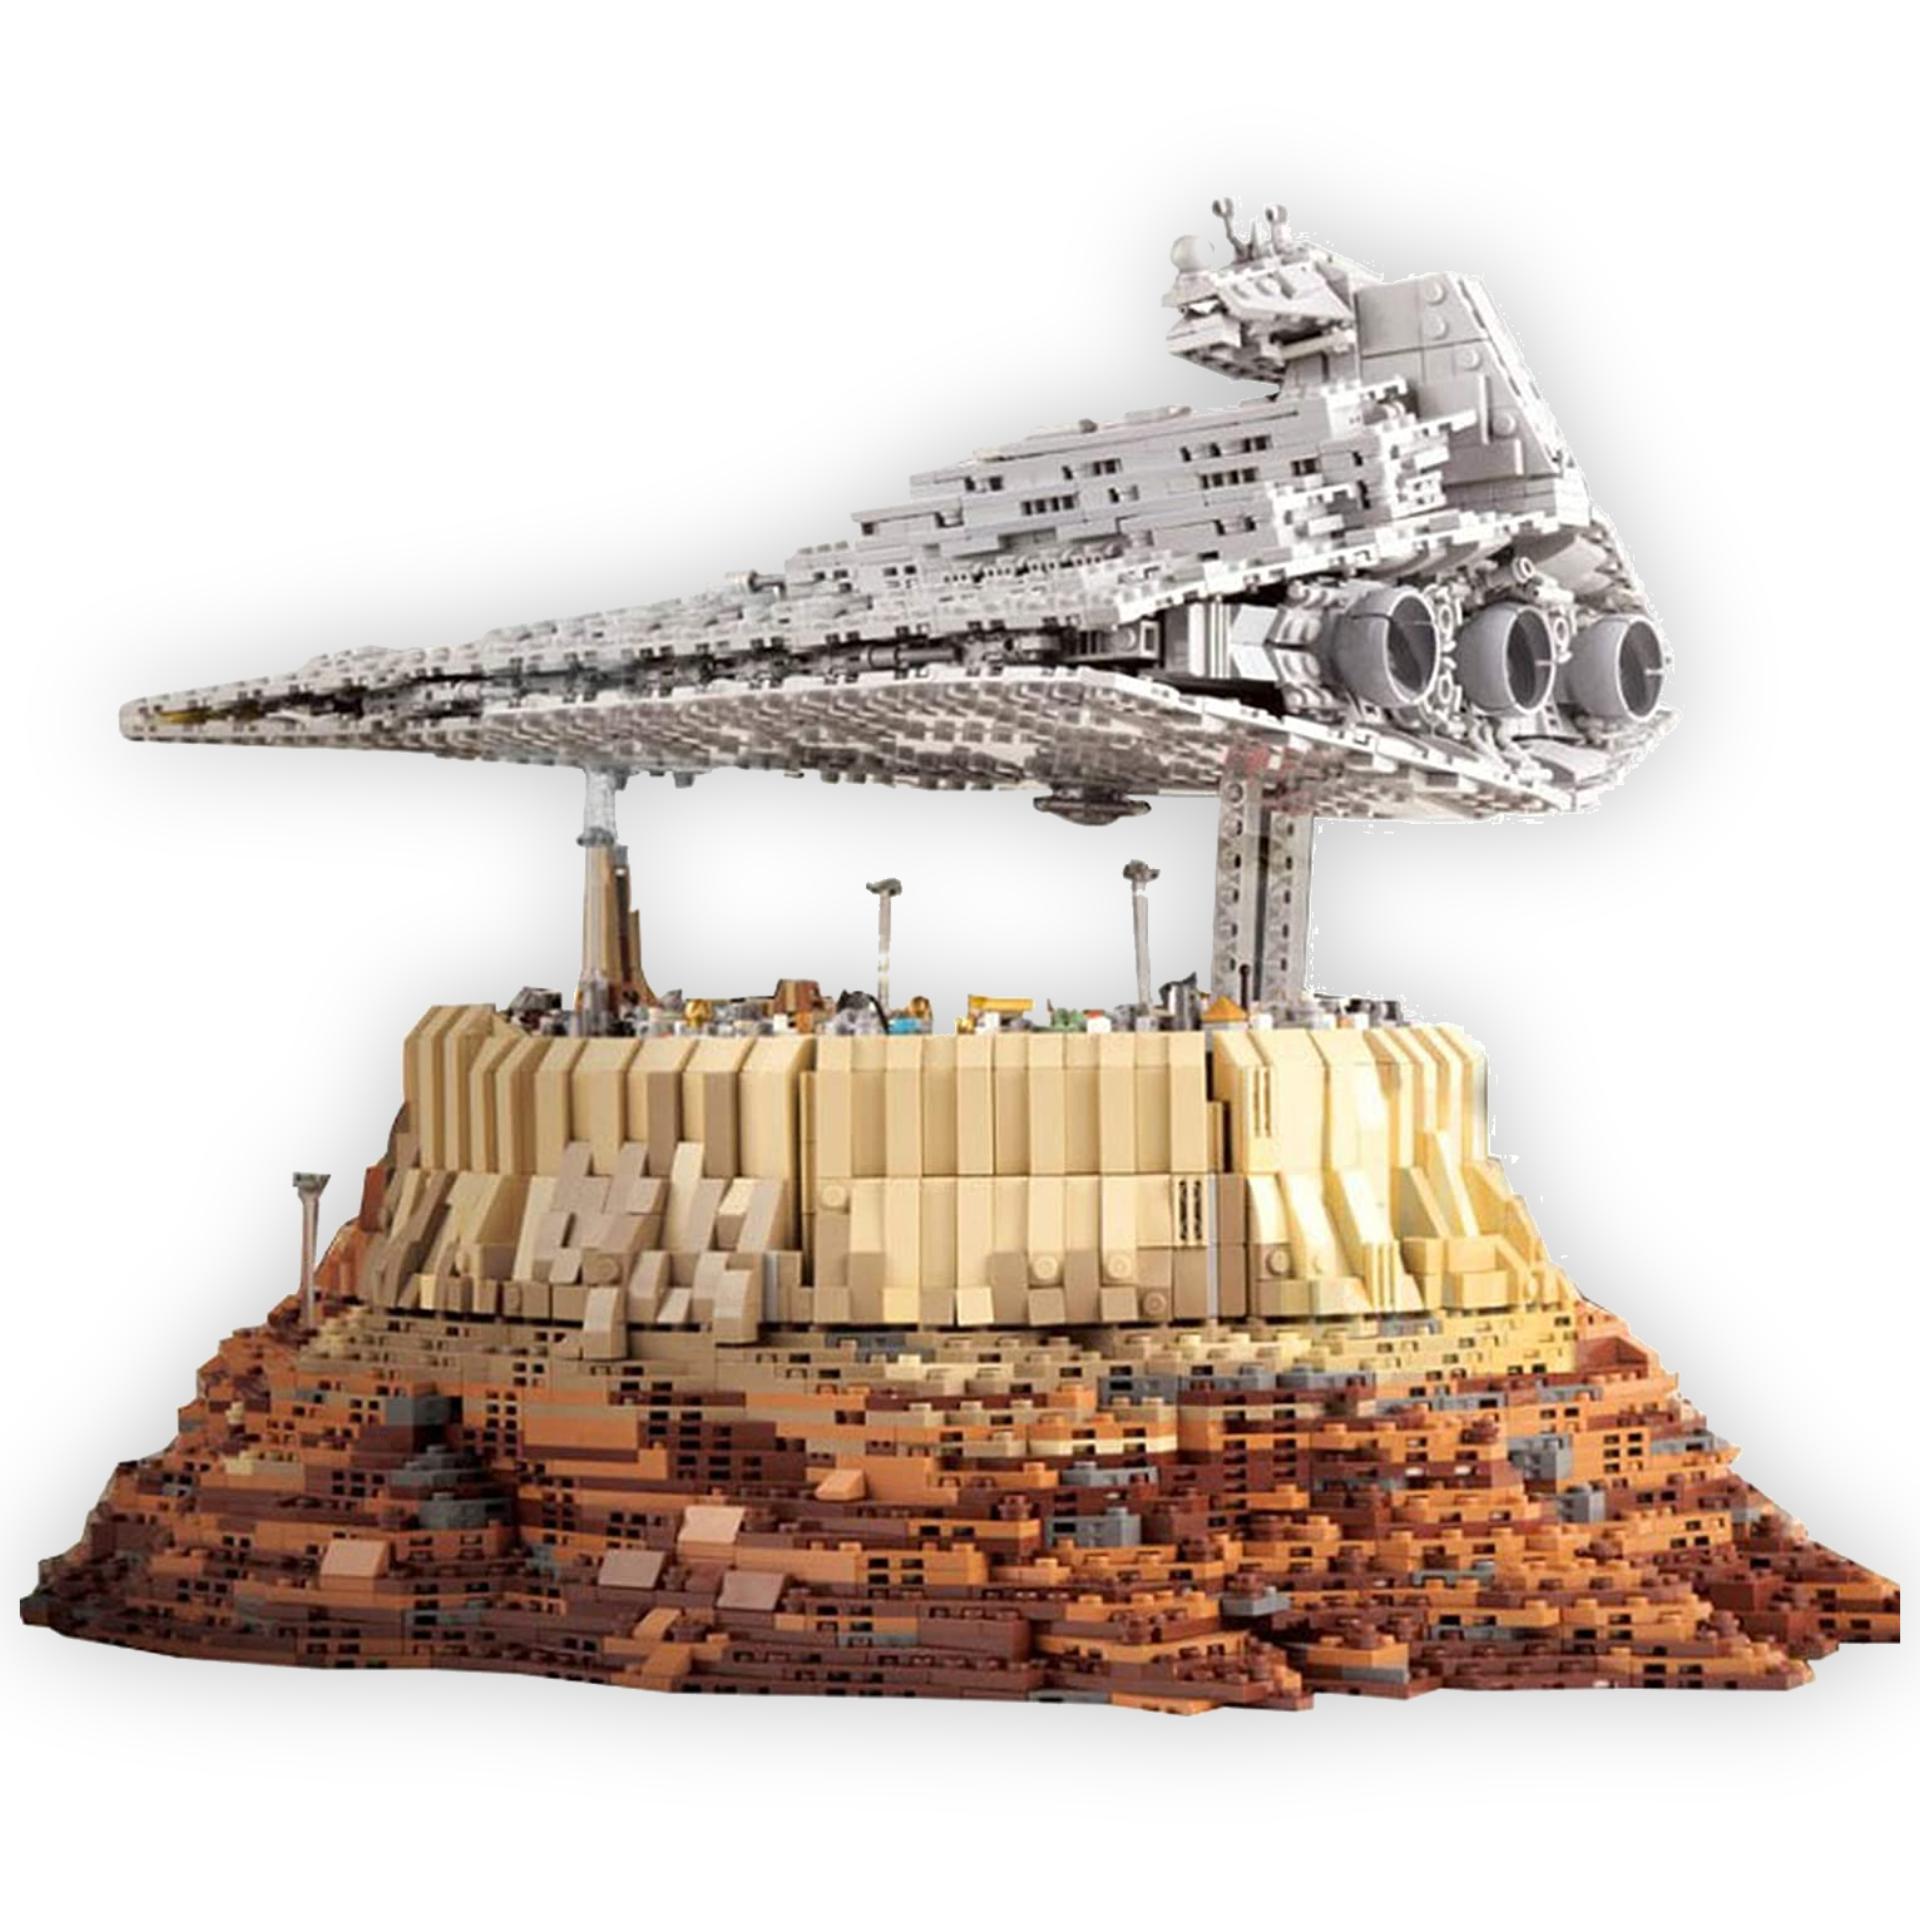 Mould King: Empire Over Jedha City - Klemmbaustein Sternenzerstörer (5162 Teile, Zwillings-Ionenantrieb, Star Wars)